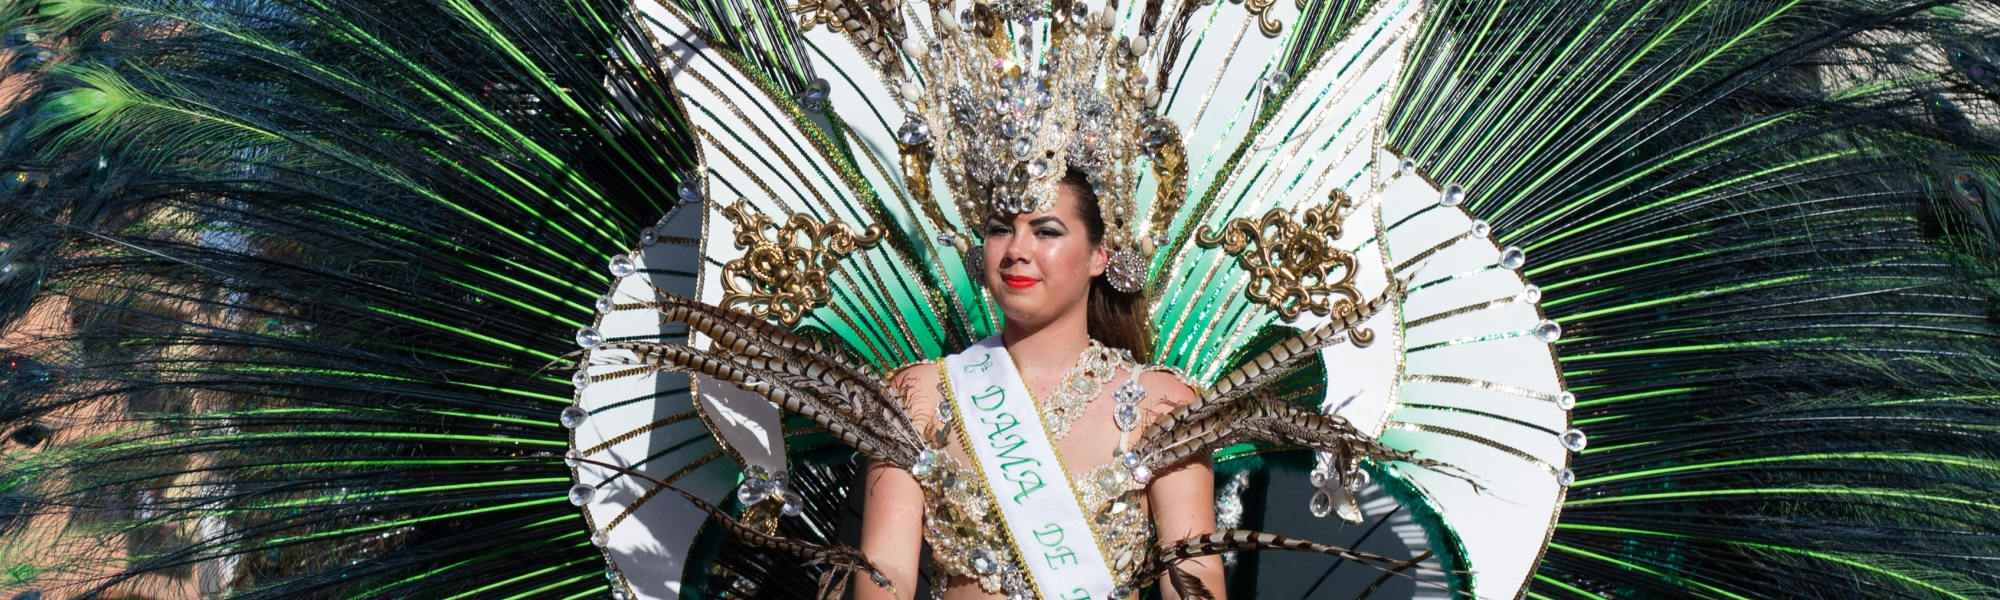 Carnaval Santa Cruz de Tenerife (España)